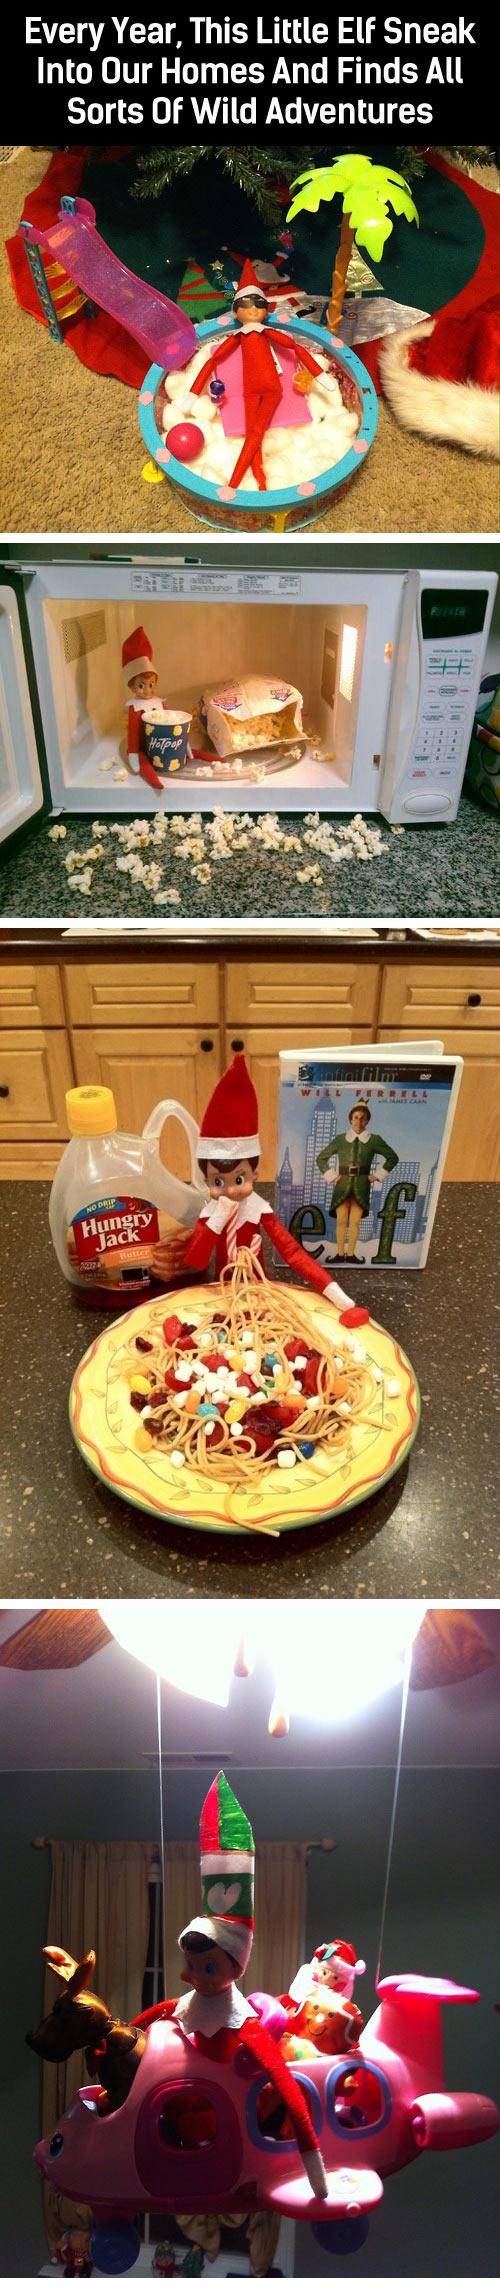 Adventures of Elf on the Shelf...